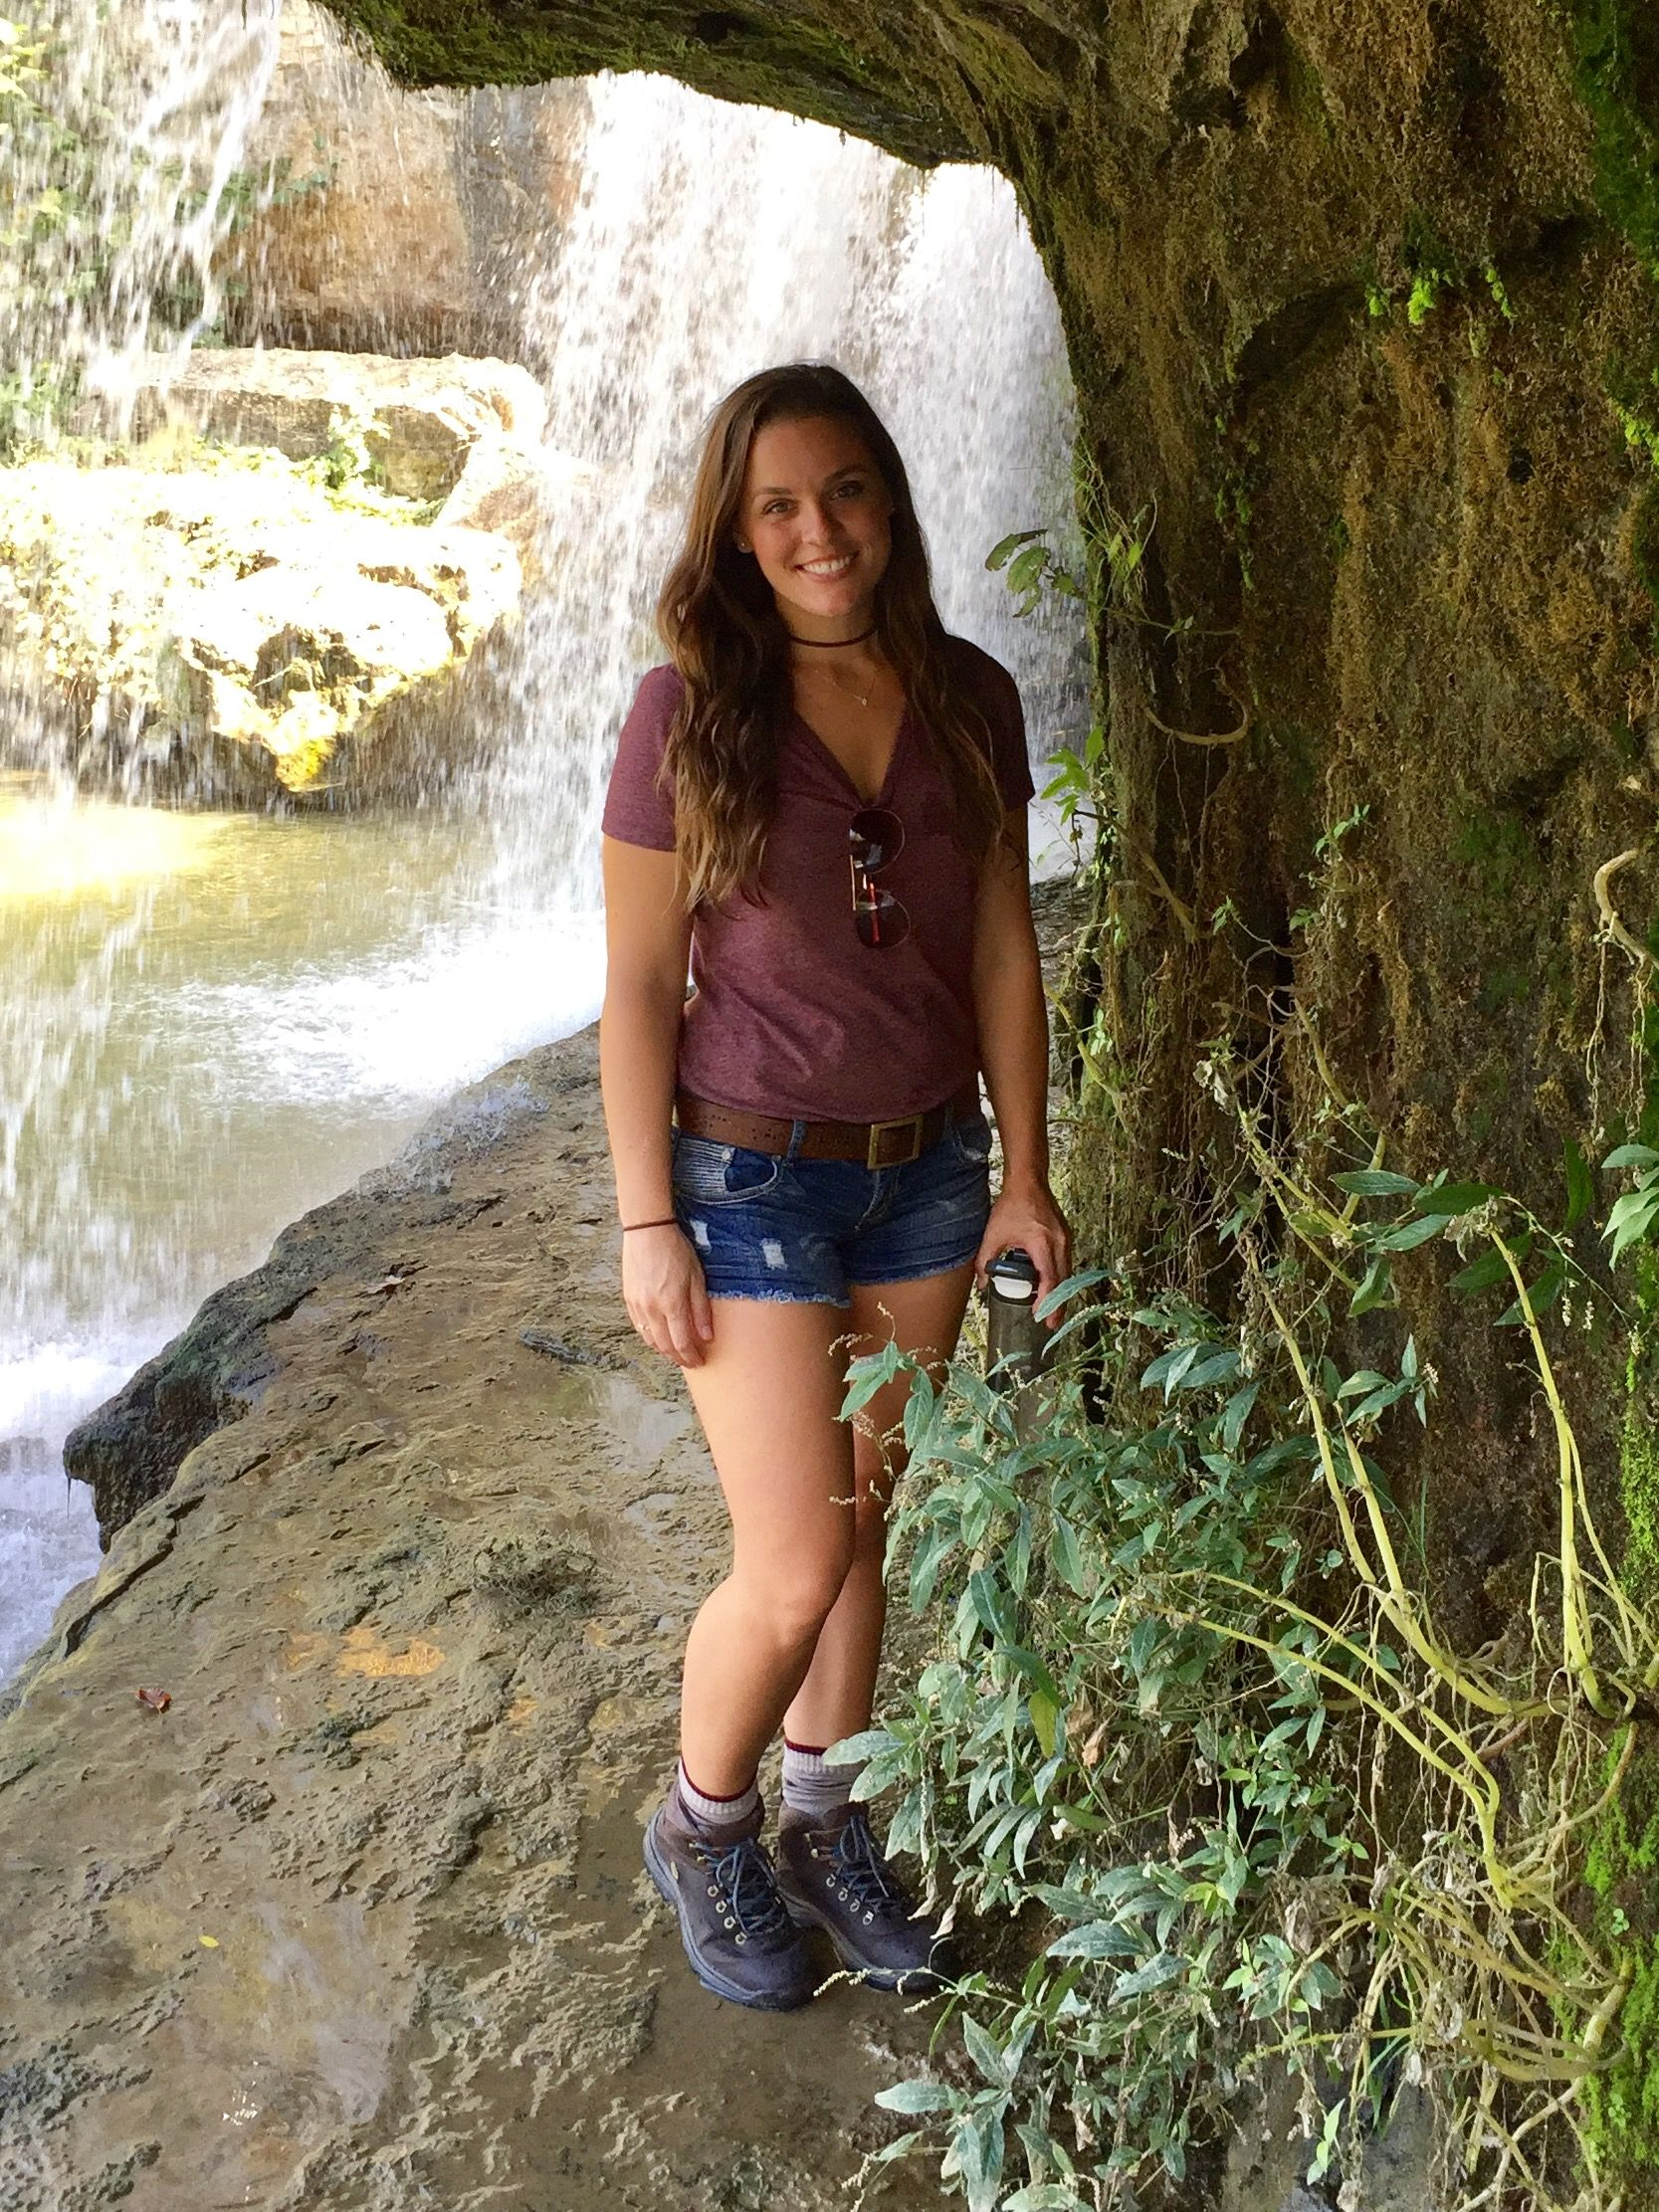 1a21249d6a1 Cute Hiking Outfit Cataract Falls